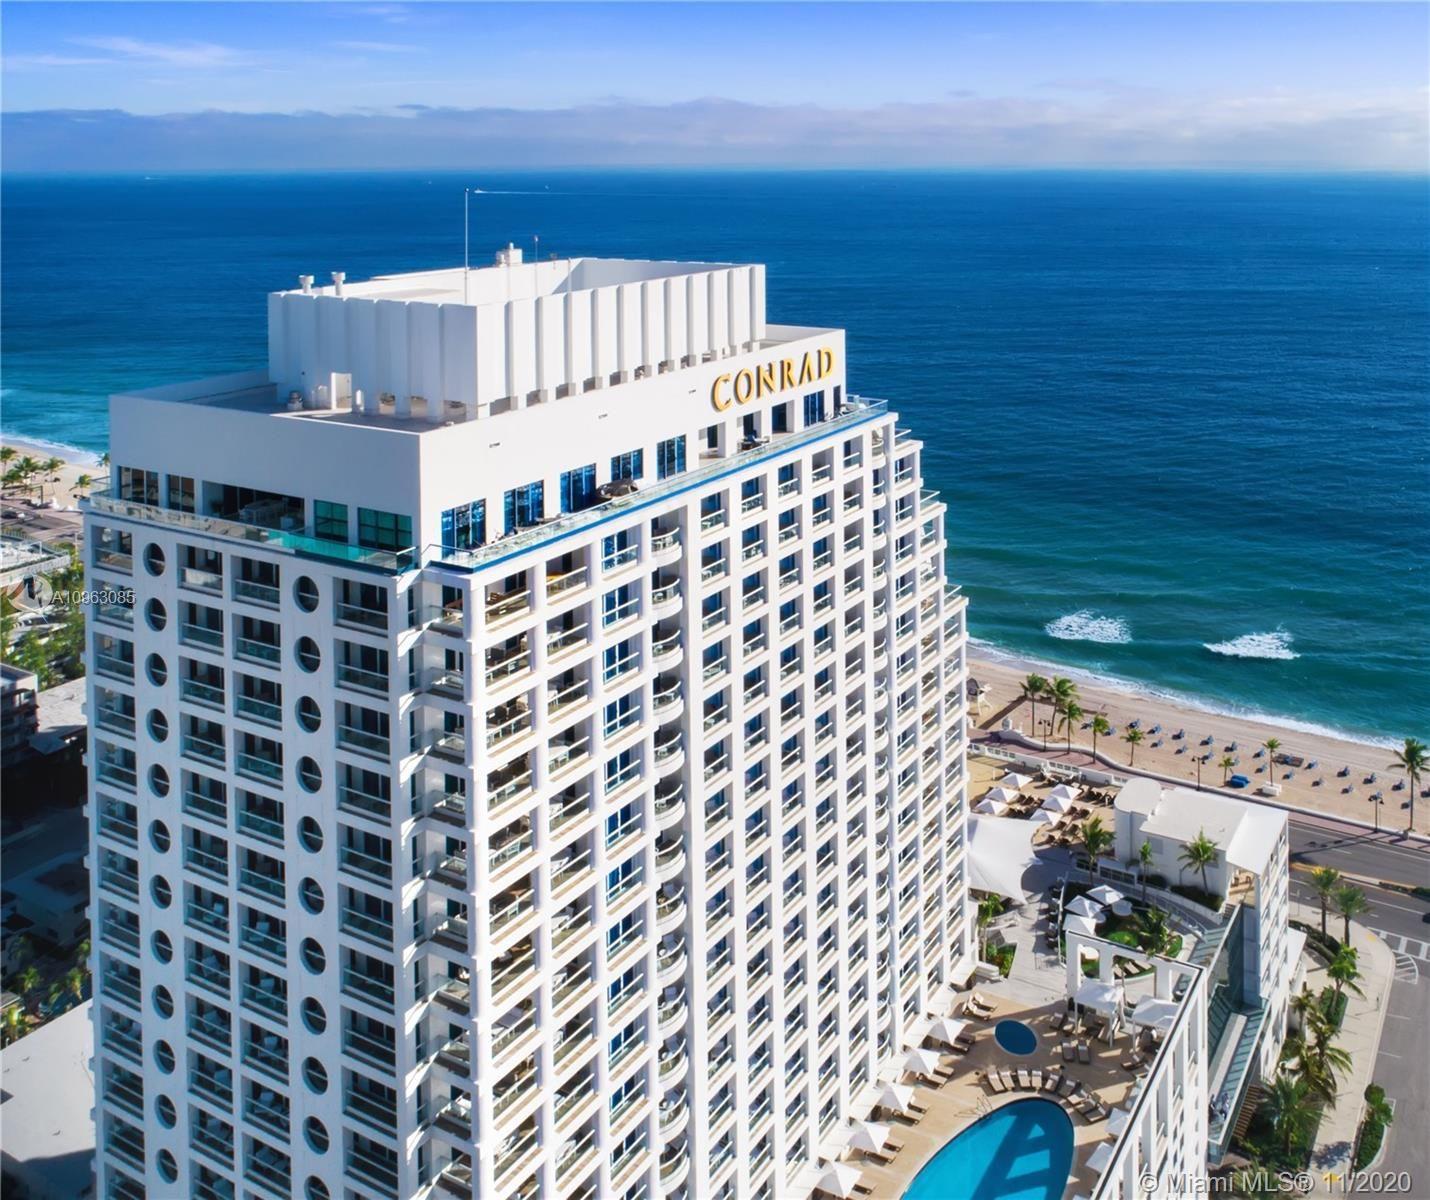 551 N Fort Lauderdale Beach Blvd R1803 Florida Resorts Fort Lauderdale Beach Lauderdale Beach